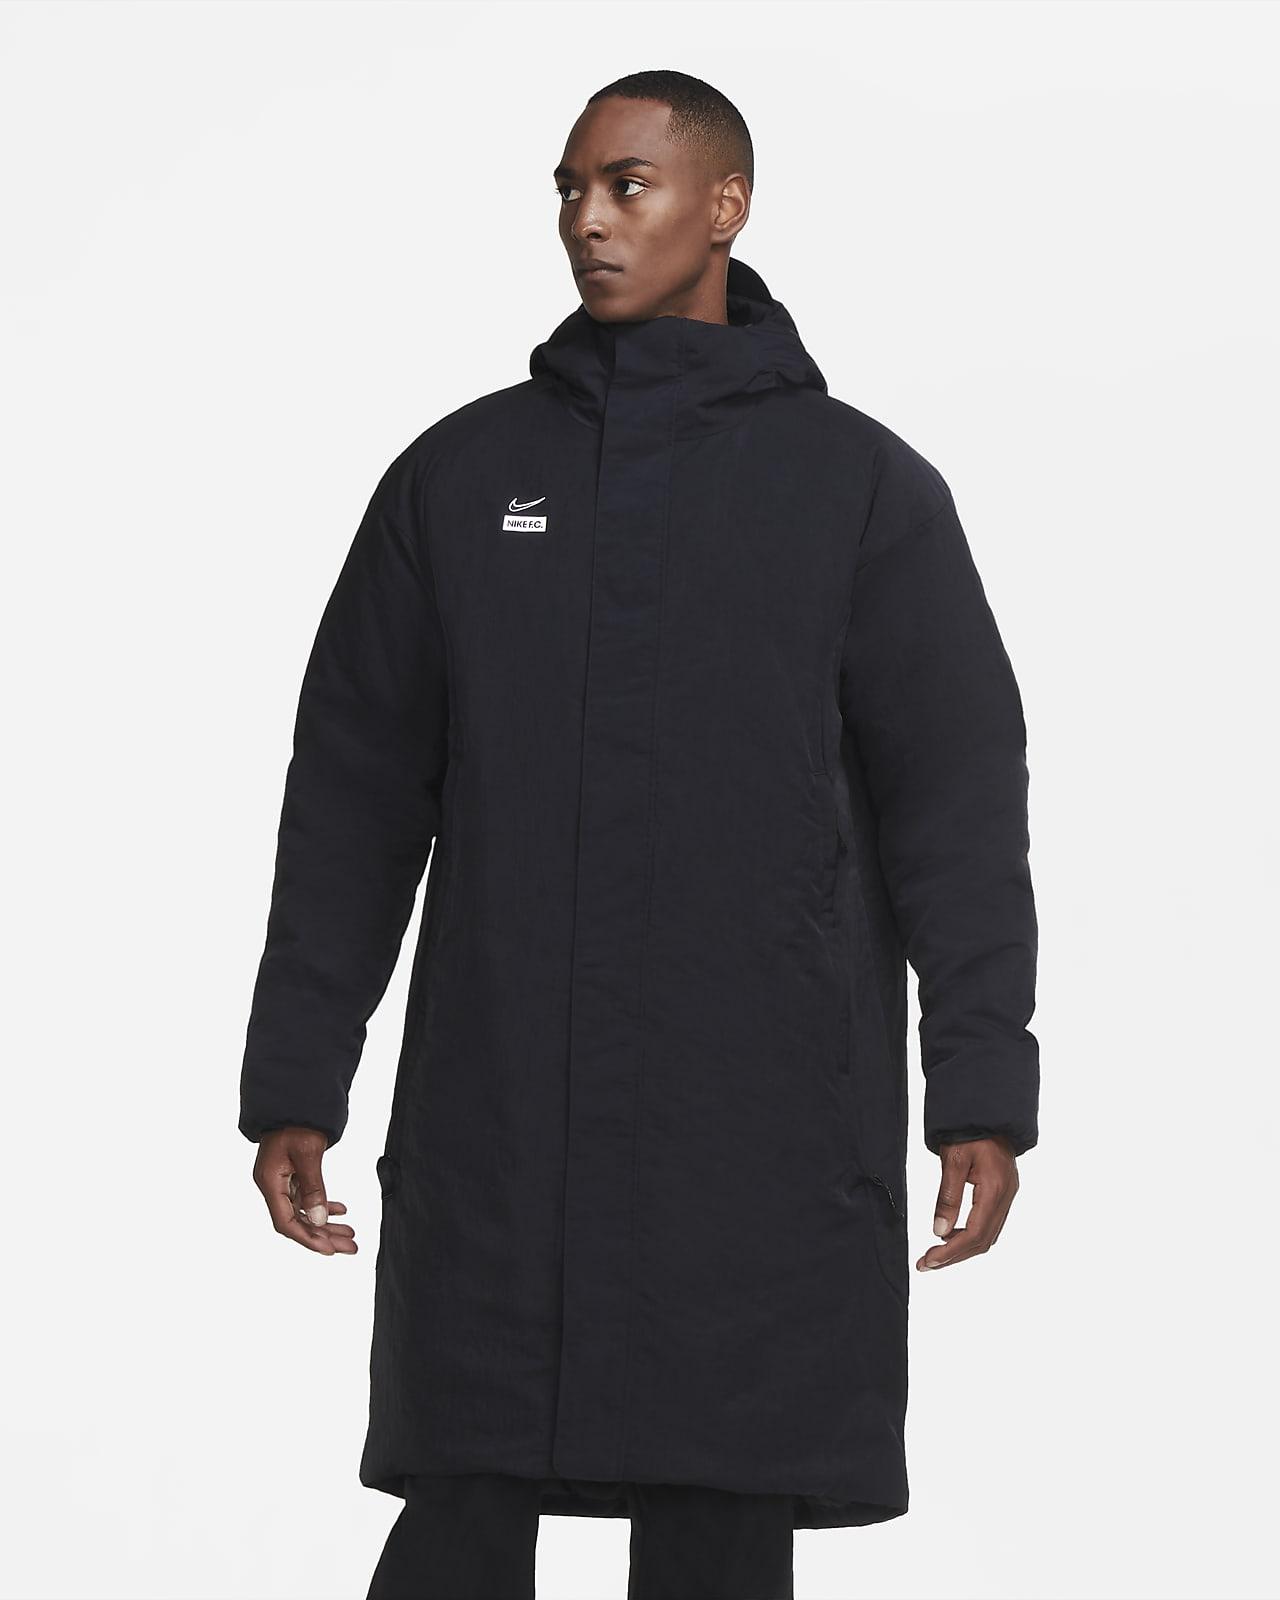 Nike F.C. Men's Synthetic-Fill Football Jacket